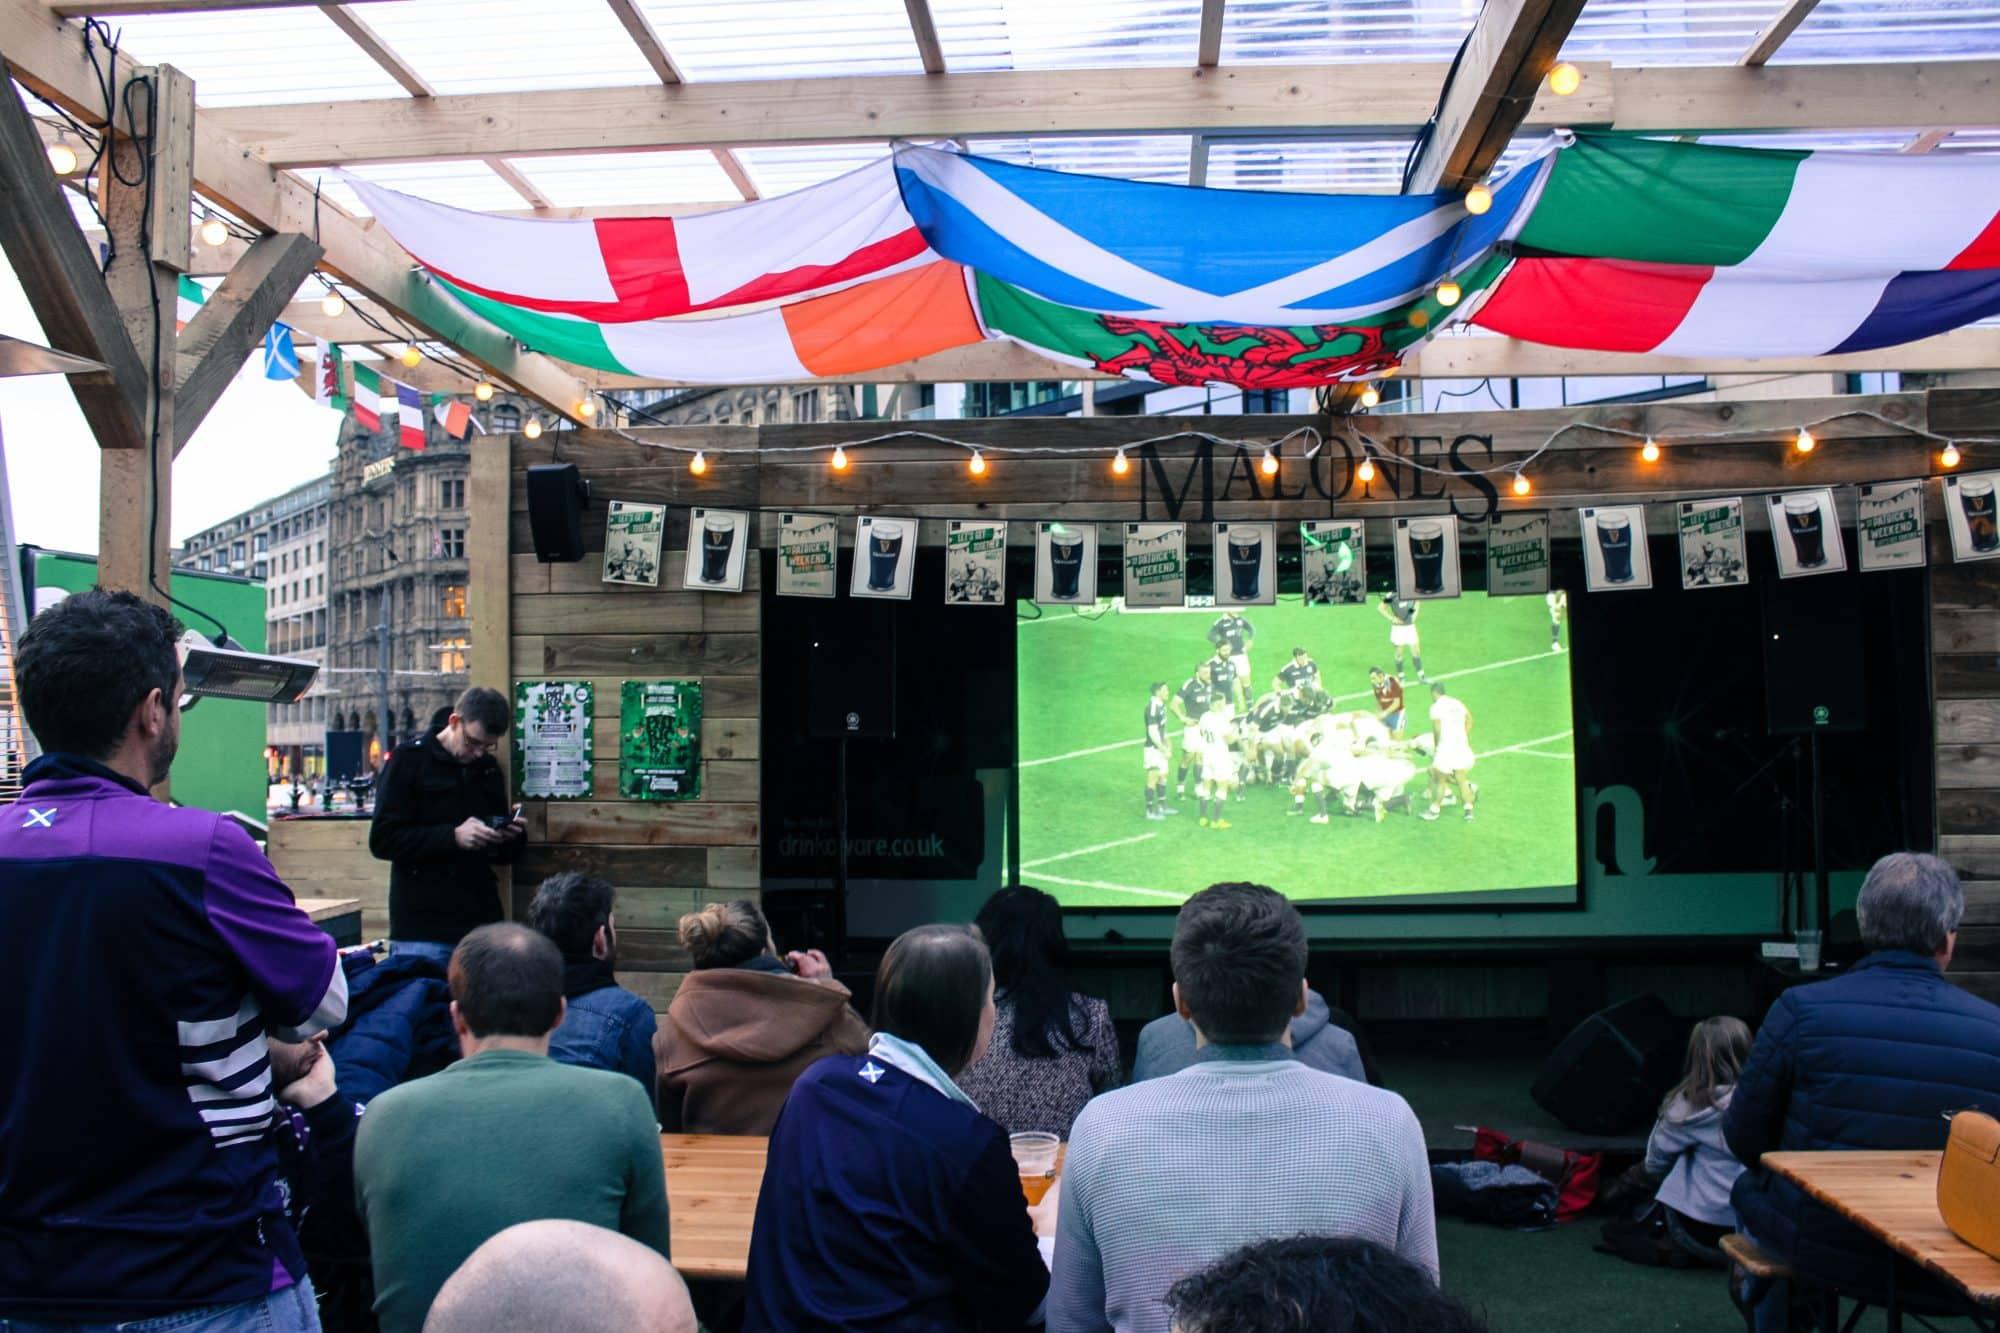 Blog le gourmand voyageur - city break Edimbourg - rugby